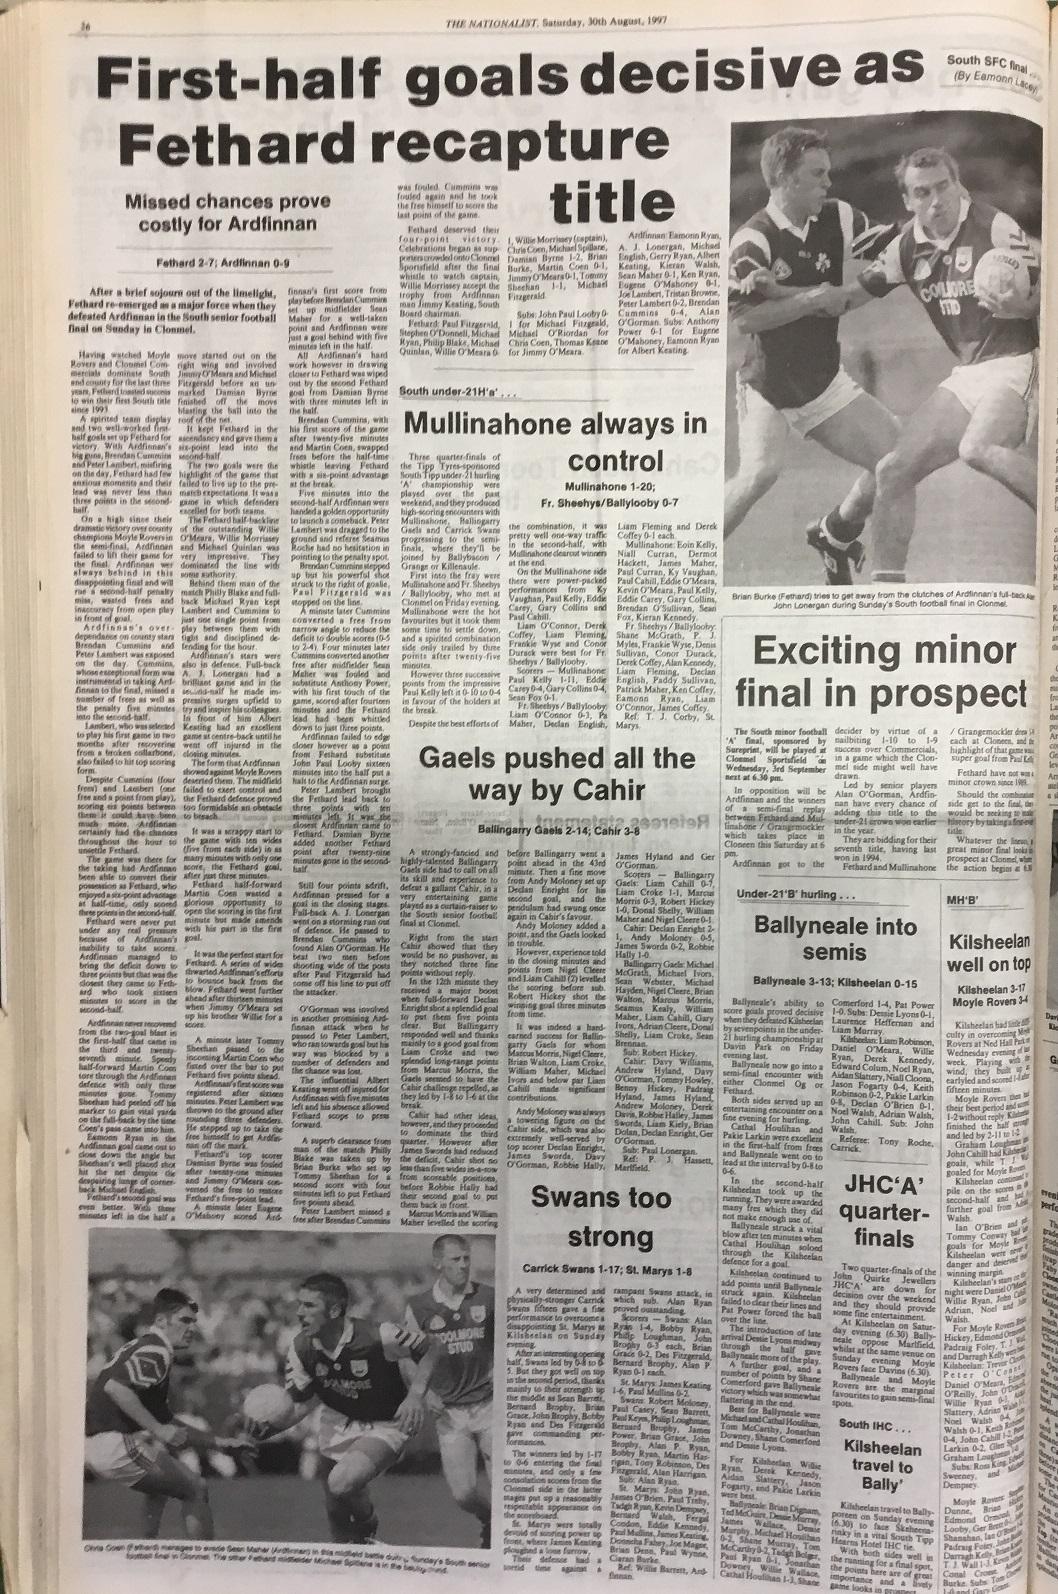 1997 South football final